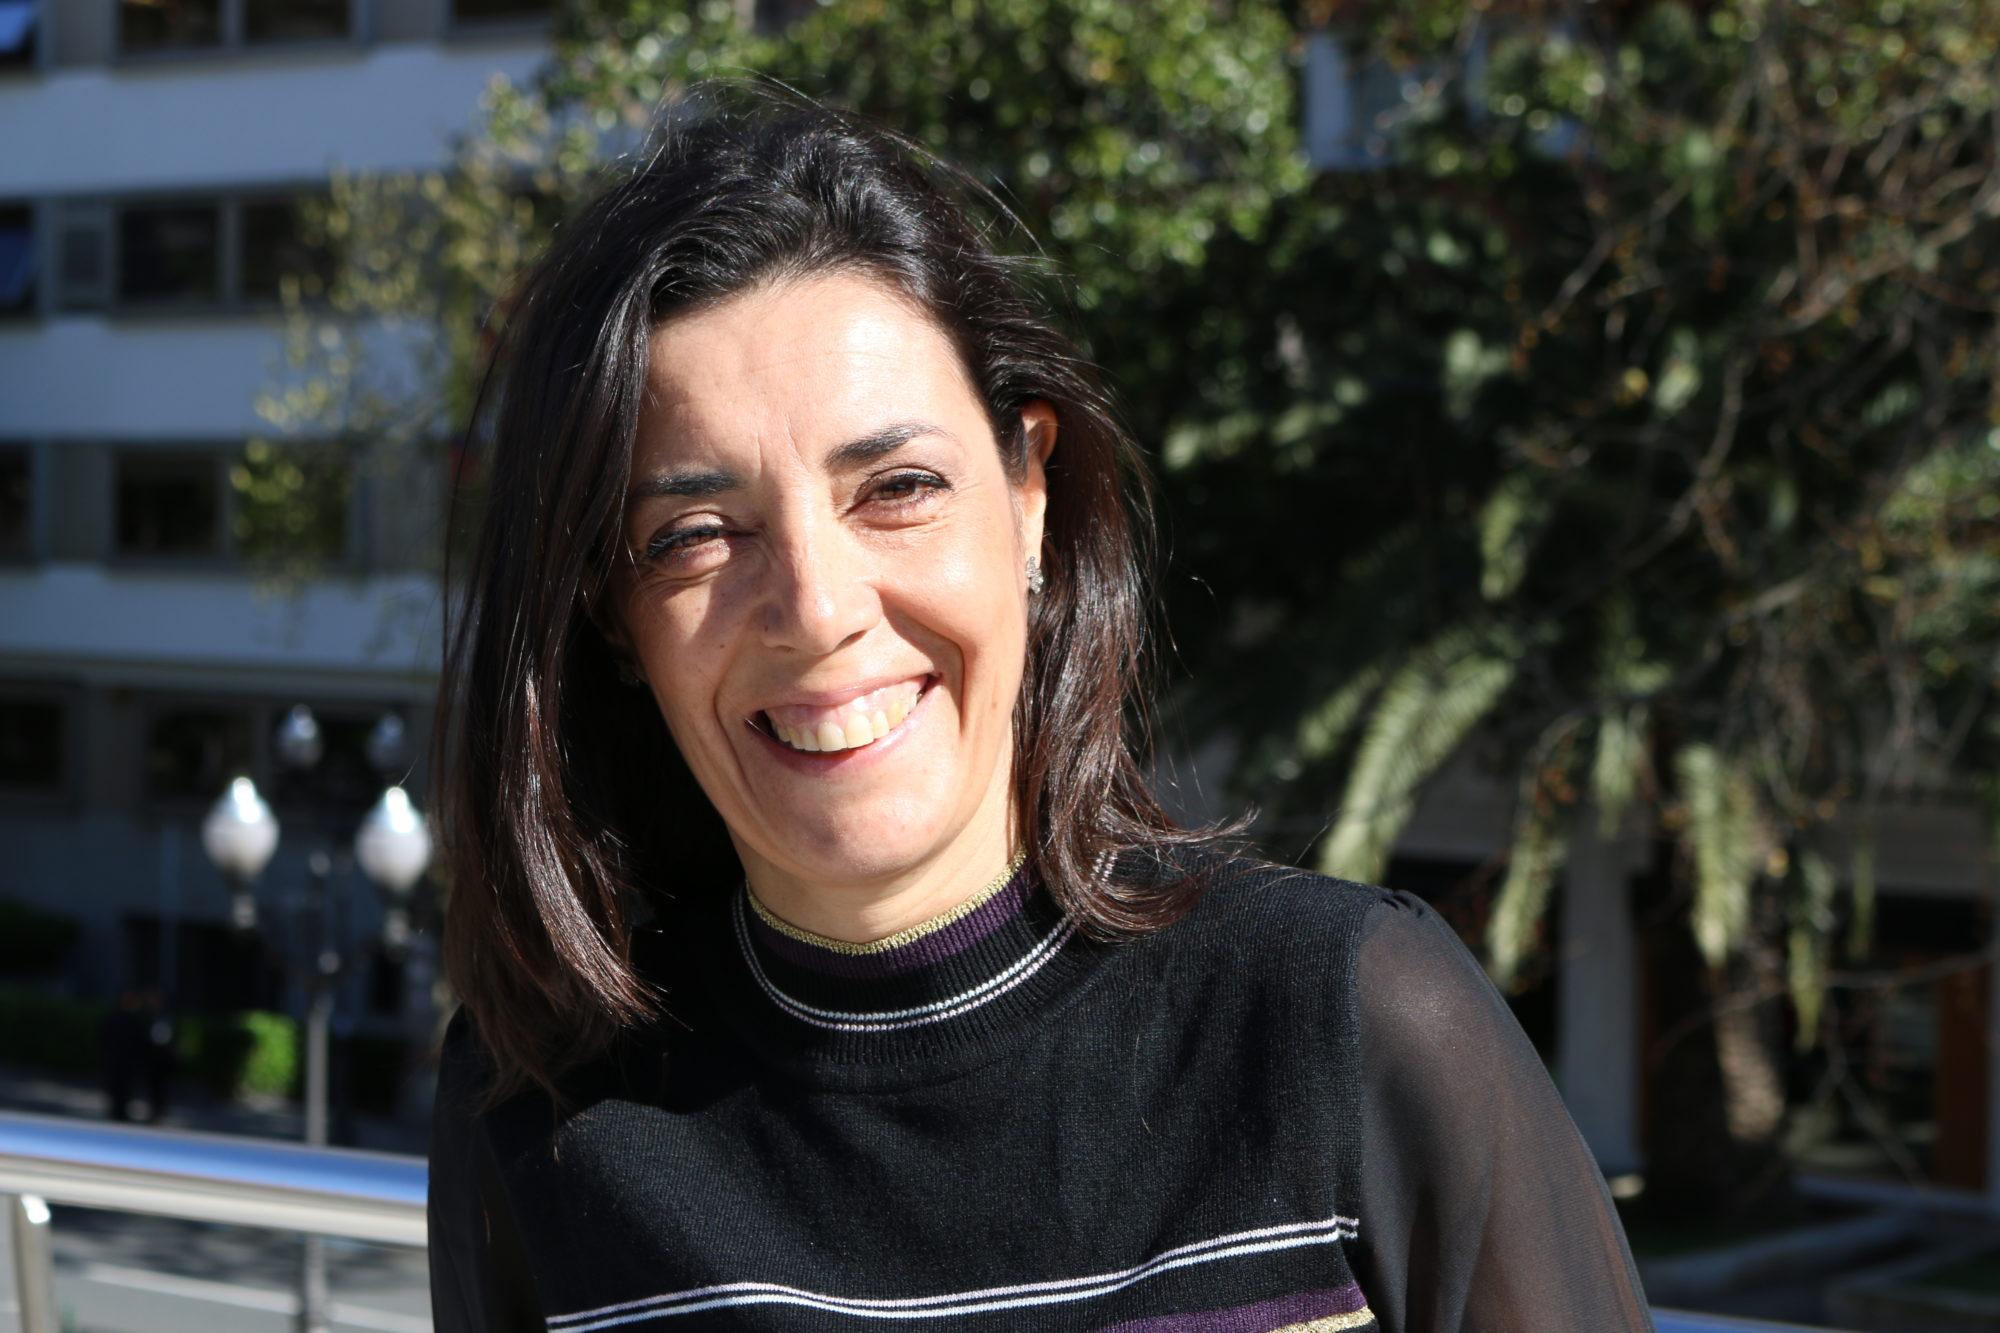 Fundación Novia Salcedo